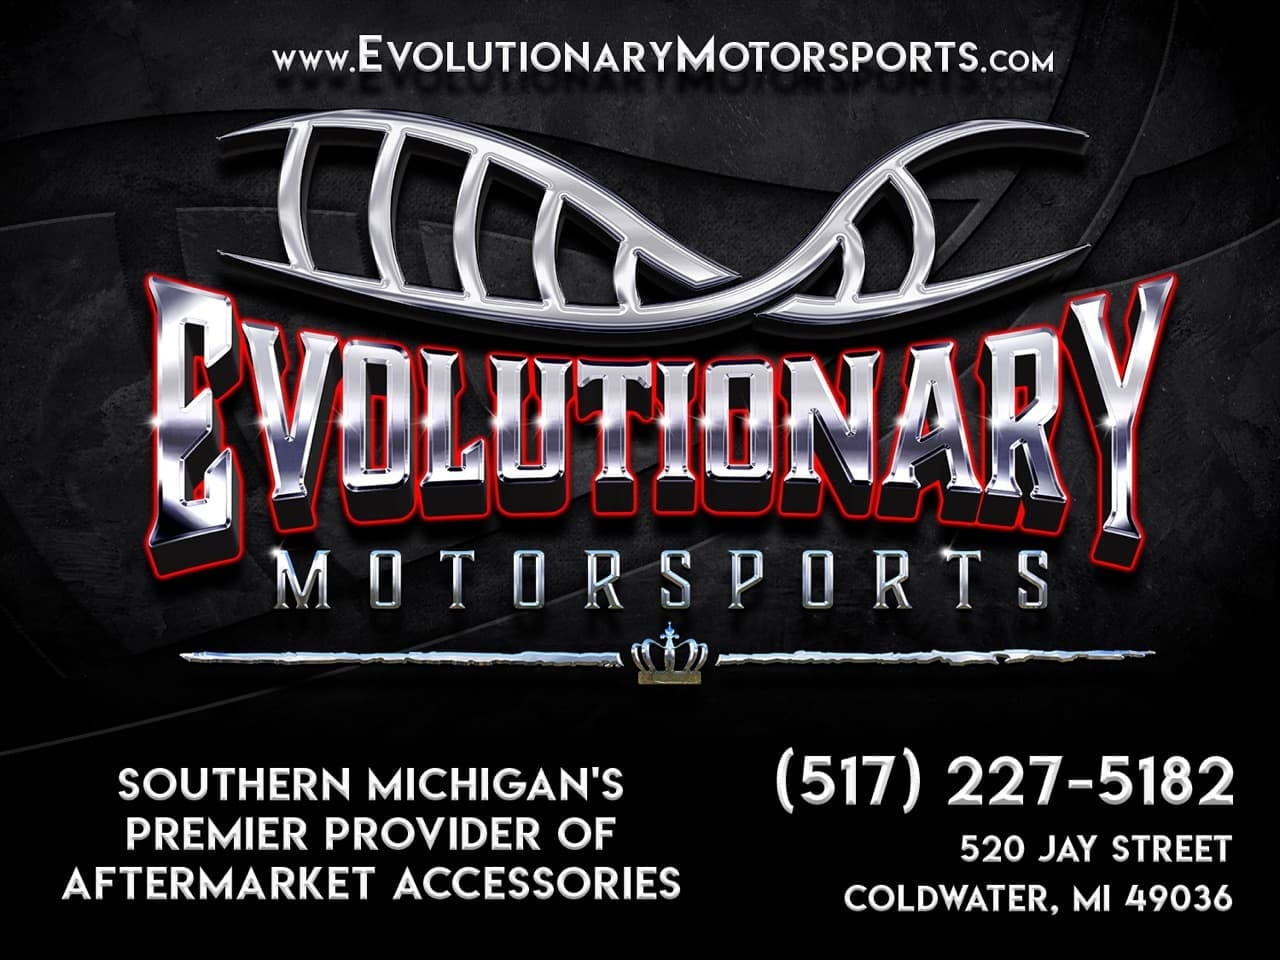 Evolutionary Motorsports